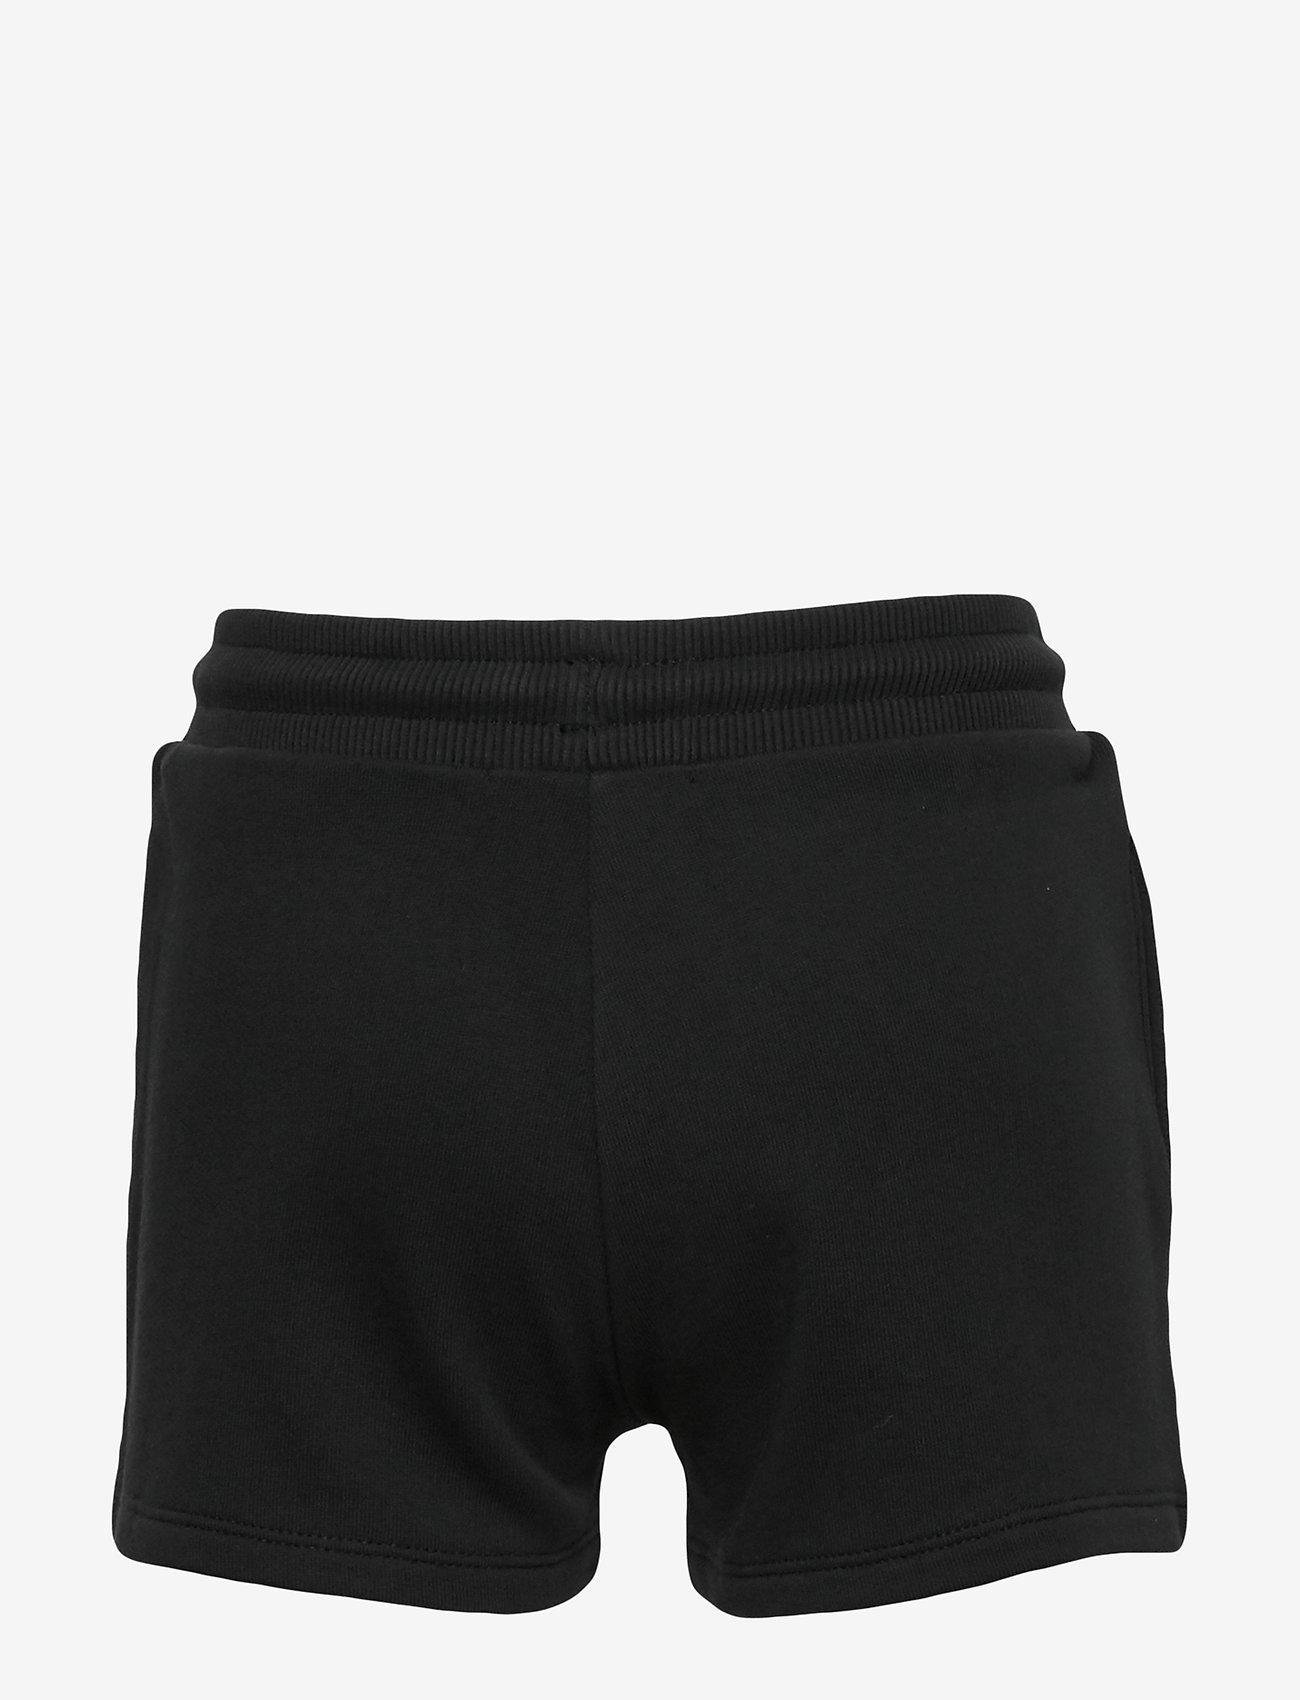 Calvin Klein - SMALL MONOGRAM SHORT - shorts - ck black - 1